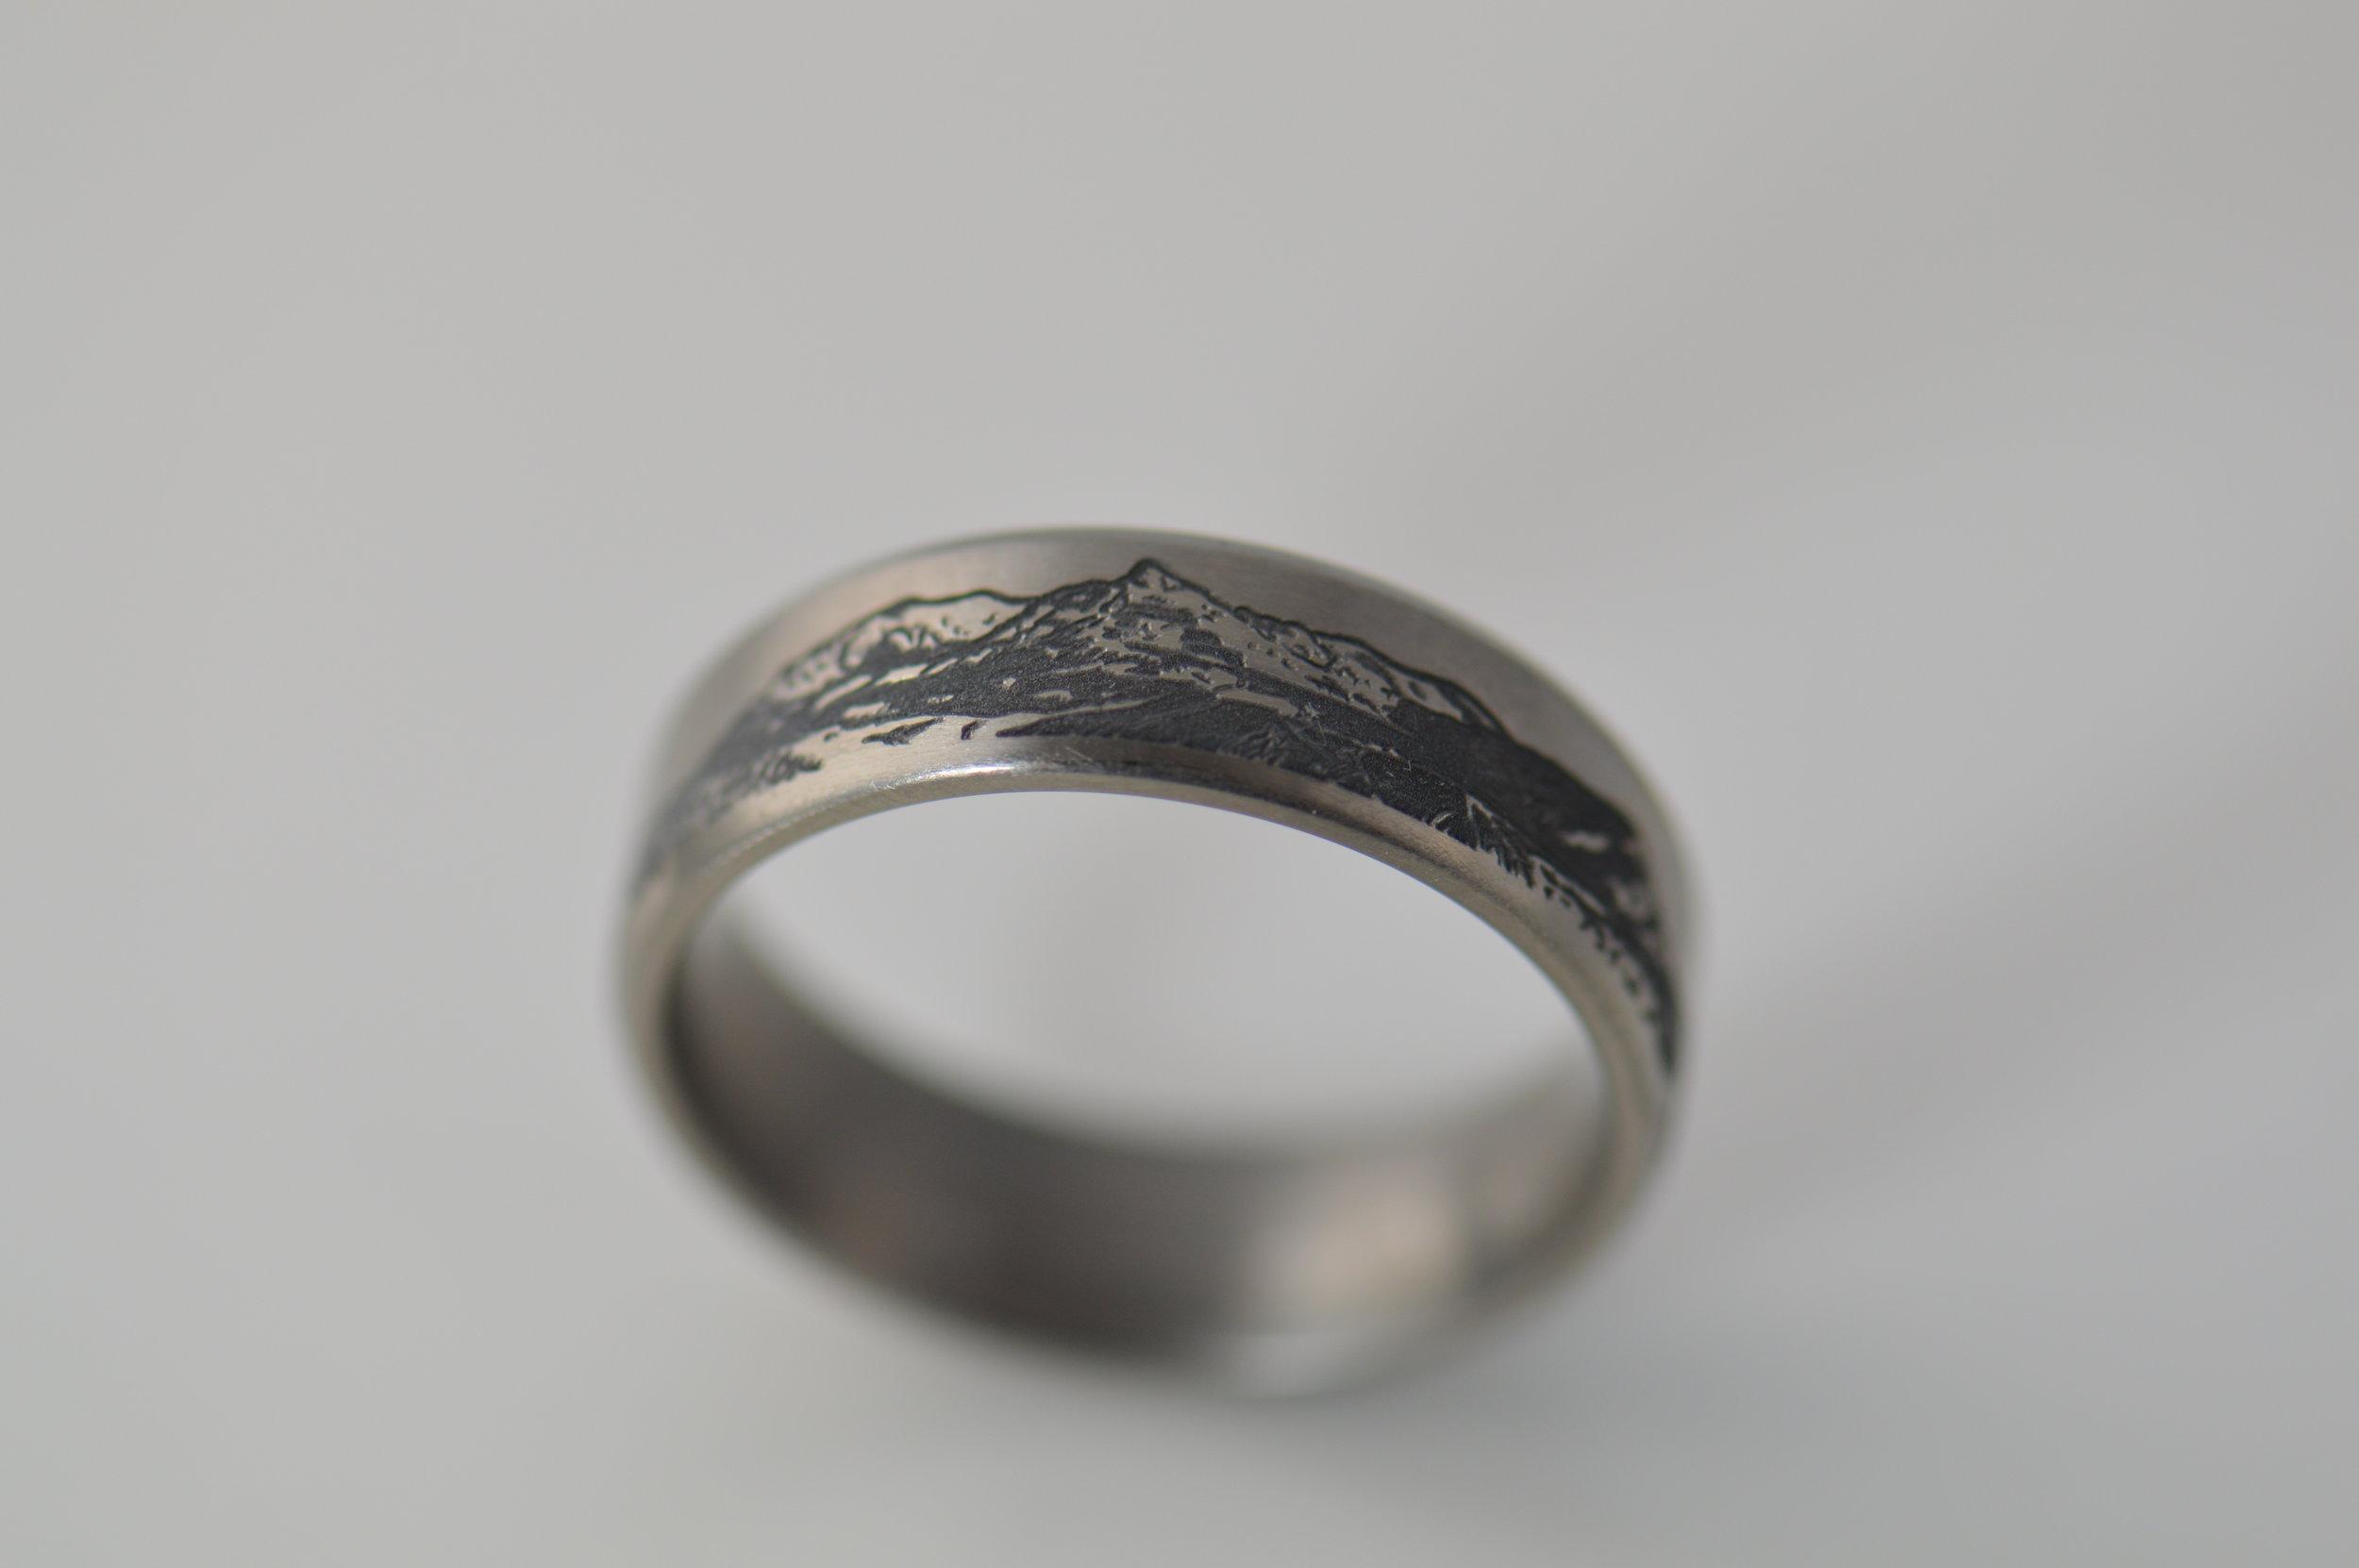 darvier-laser-engraved-mtn-art-ring.JPG